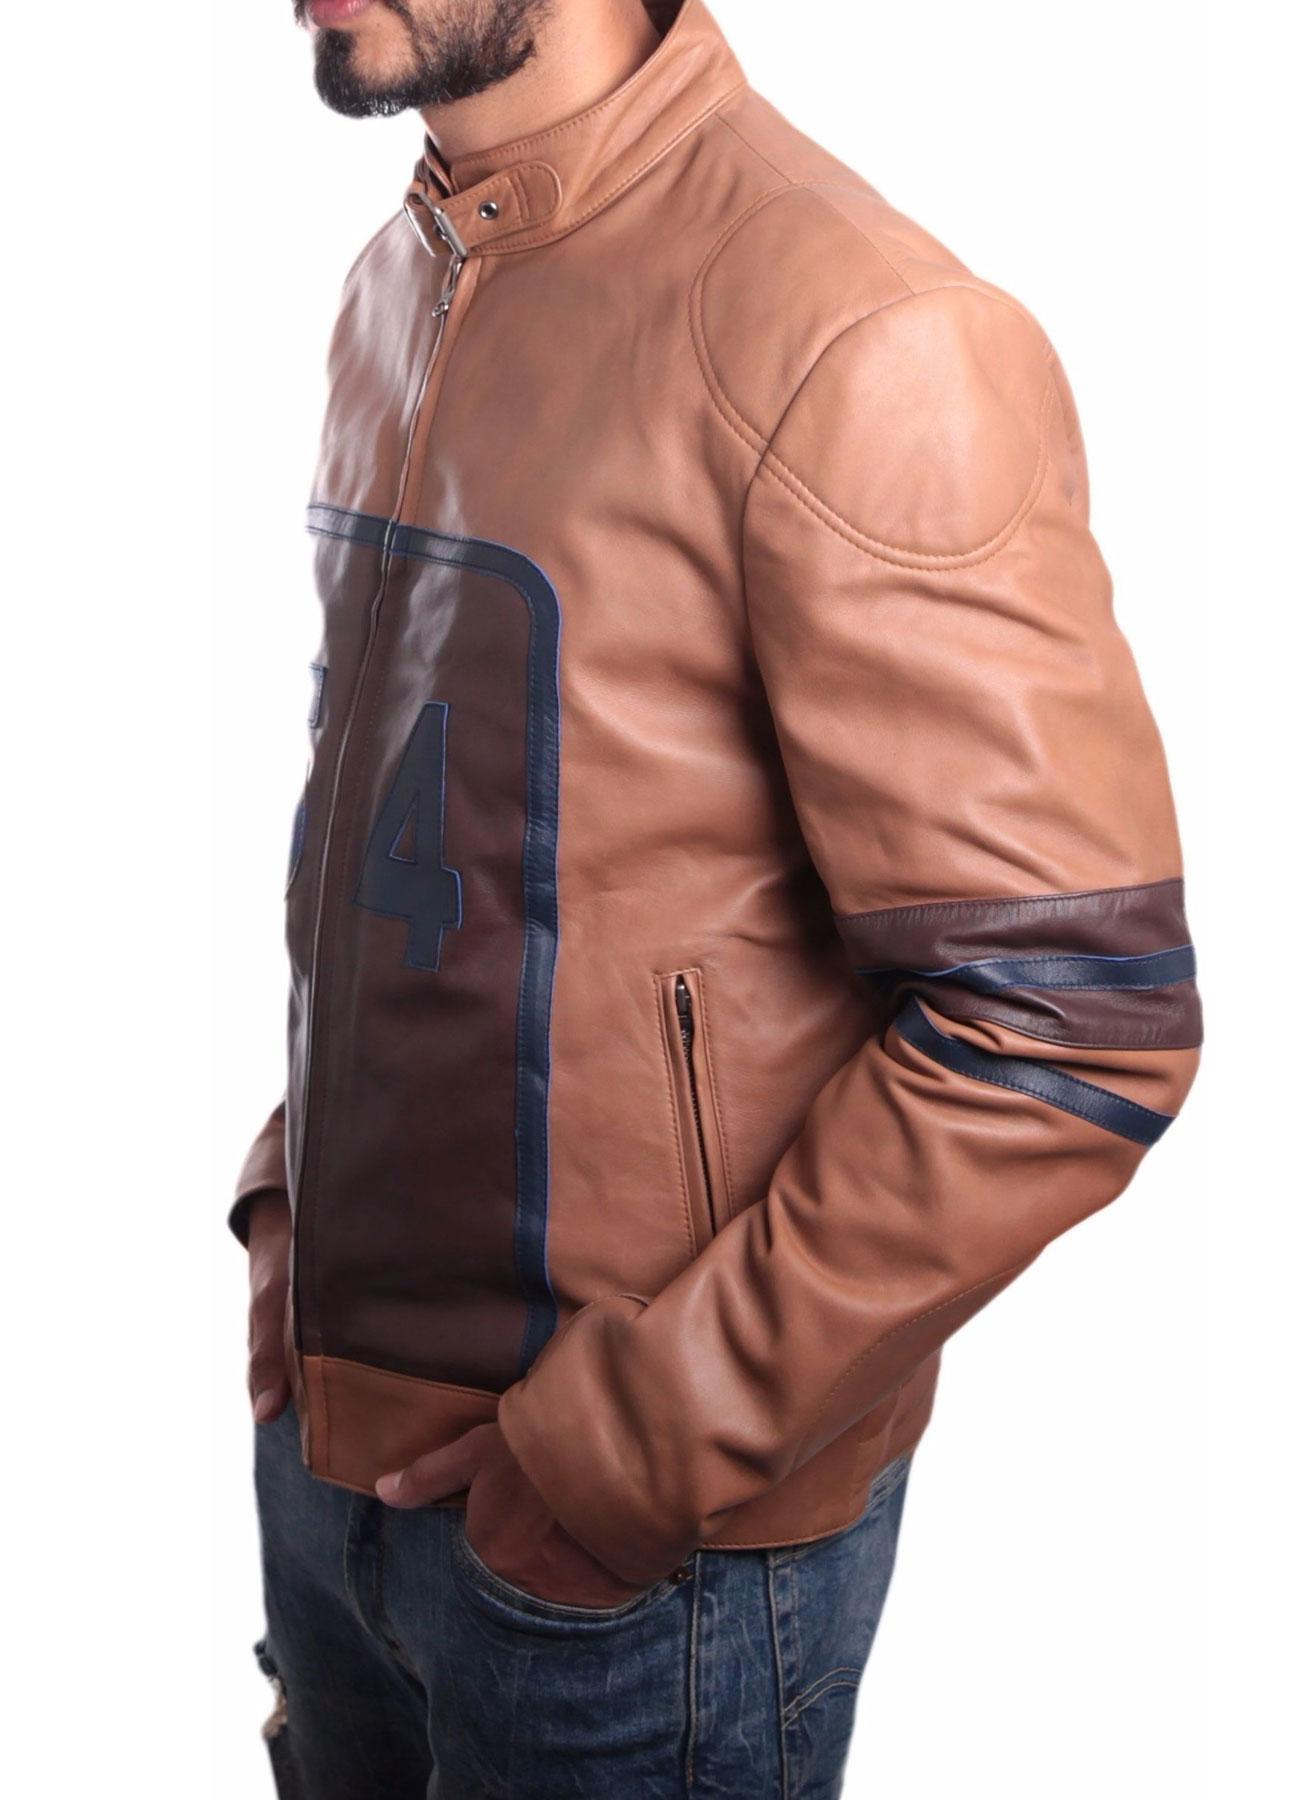 Cowhide Racing Leather Jacket Tan Brown For Men's